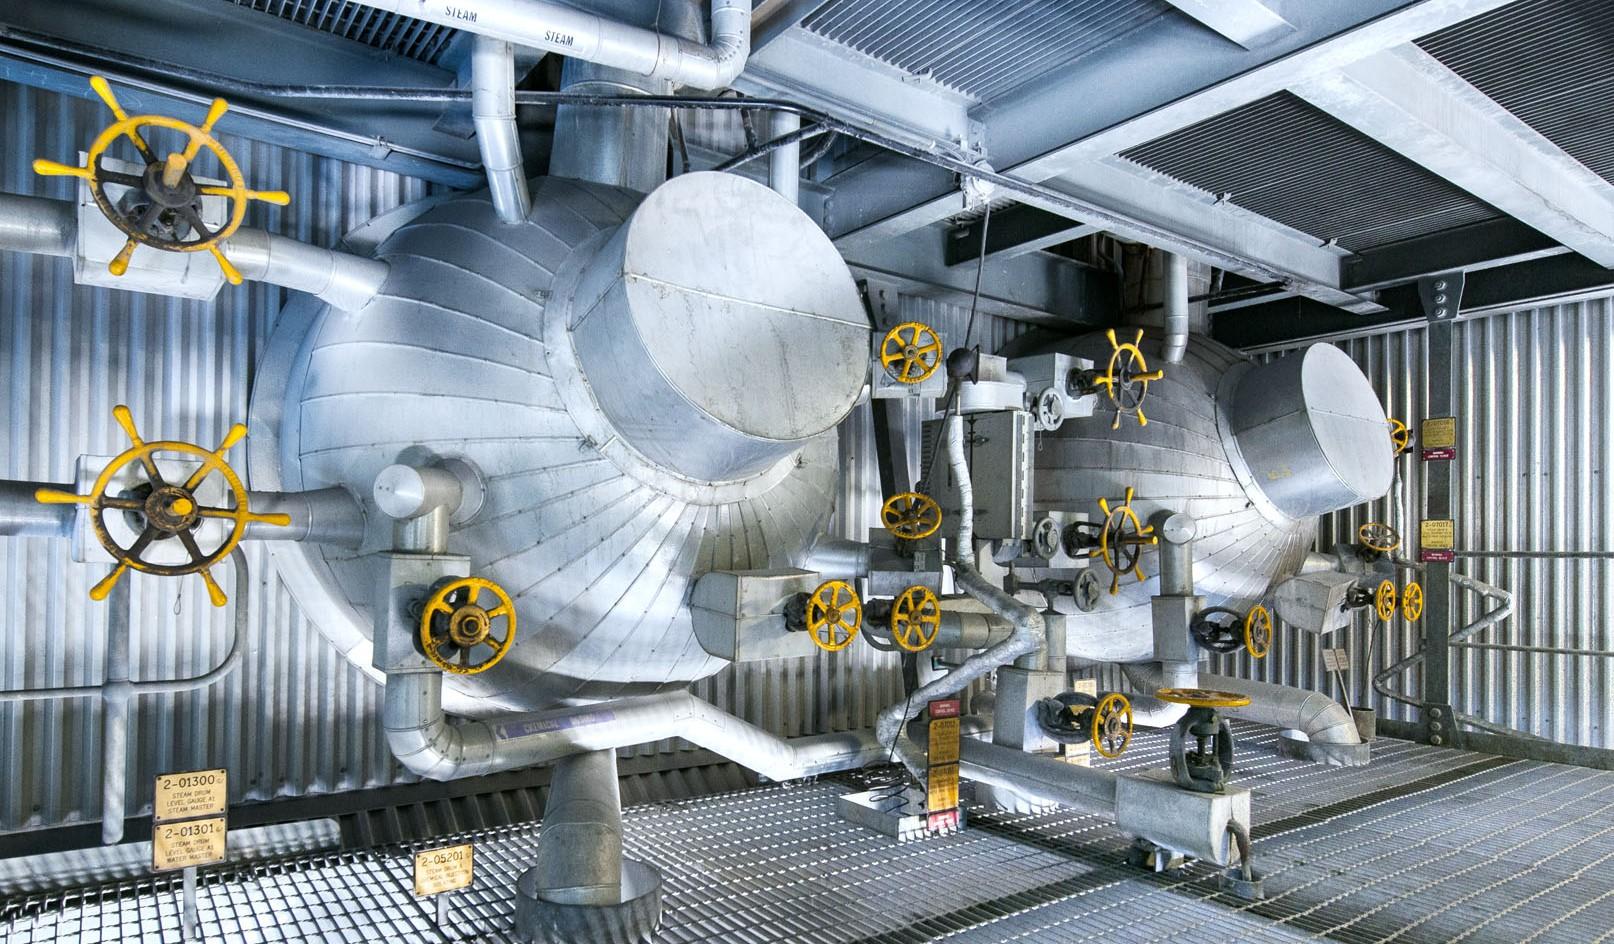 <div>Industrial</div><div> <a href='https://nedmeldrum.com.au/project/pipes/'>View Series</a></div>